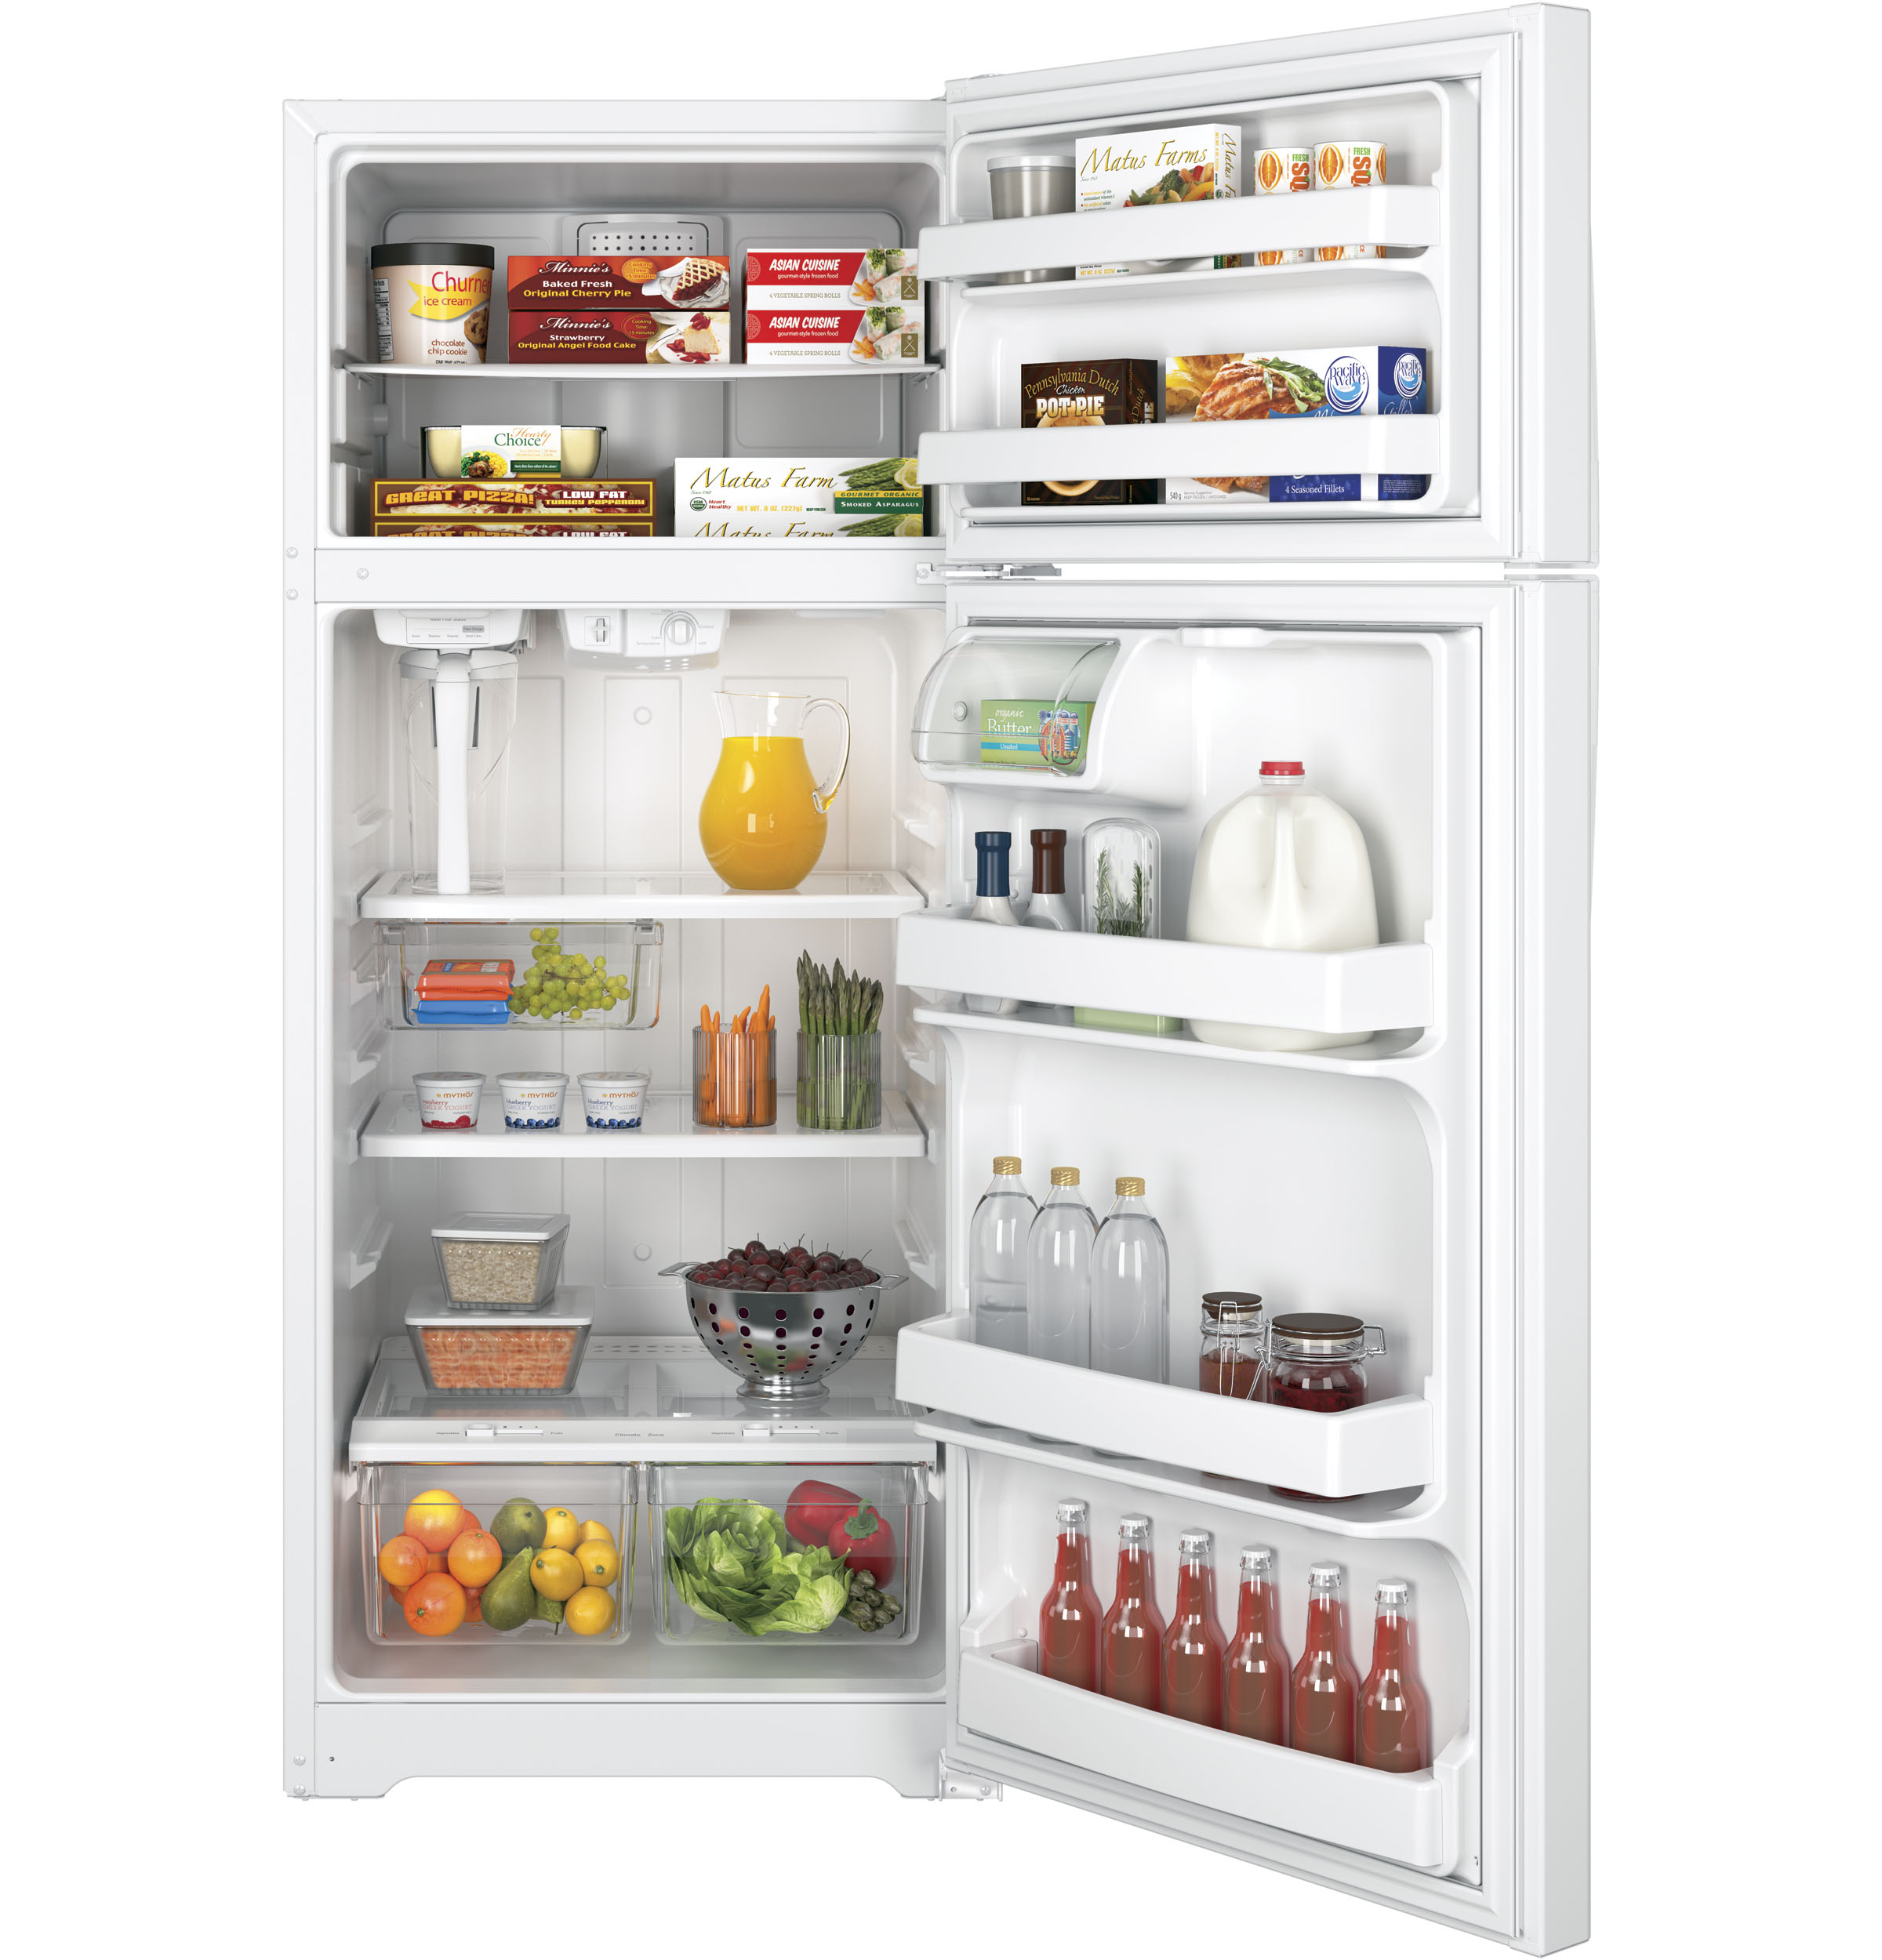 GE Appliances GAS18PGJWW 17.5 cu. ft. Top Freezer Refrigerator - White